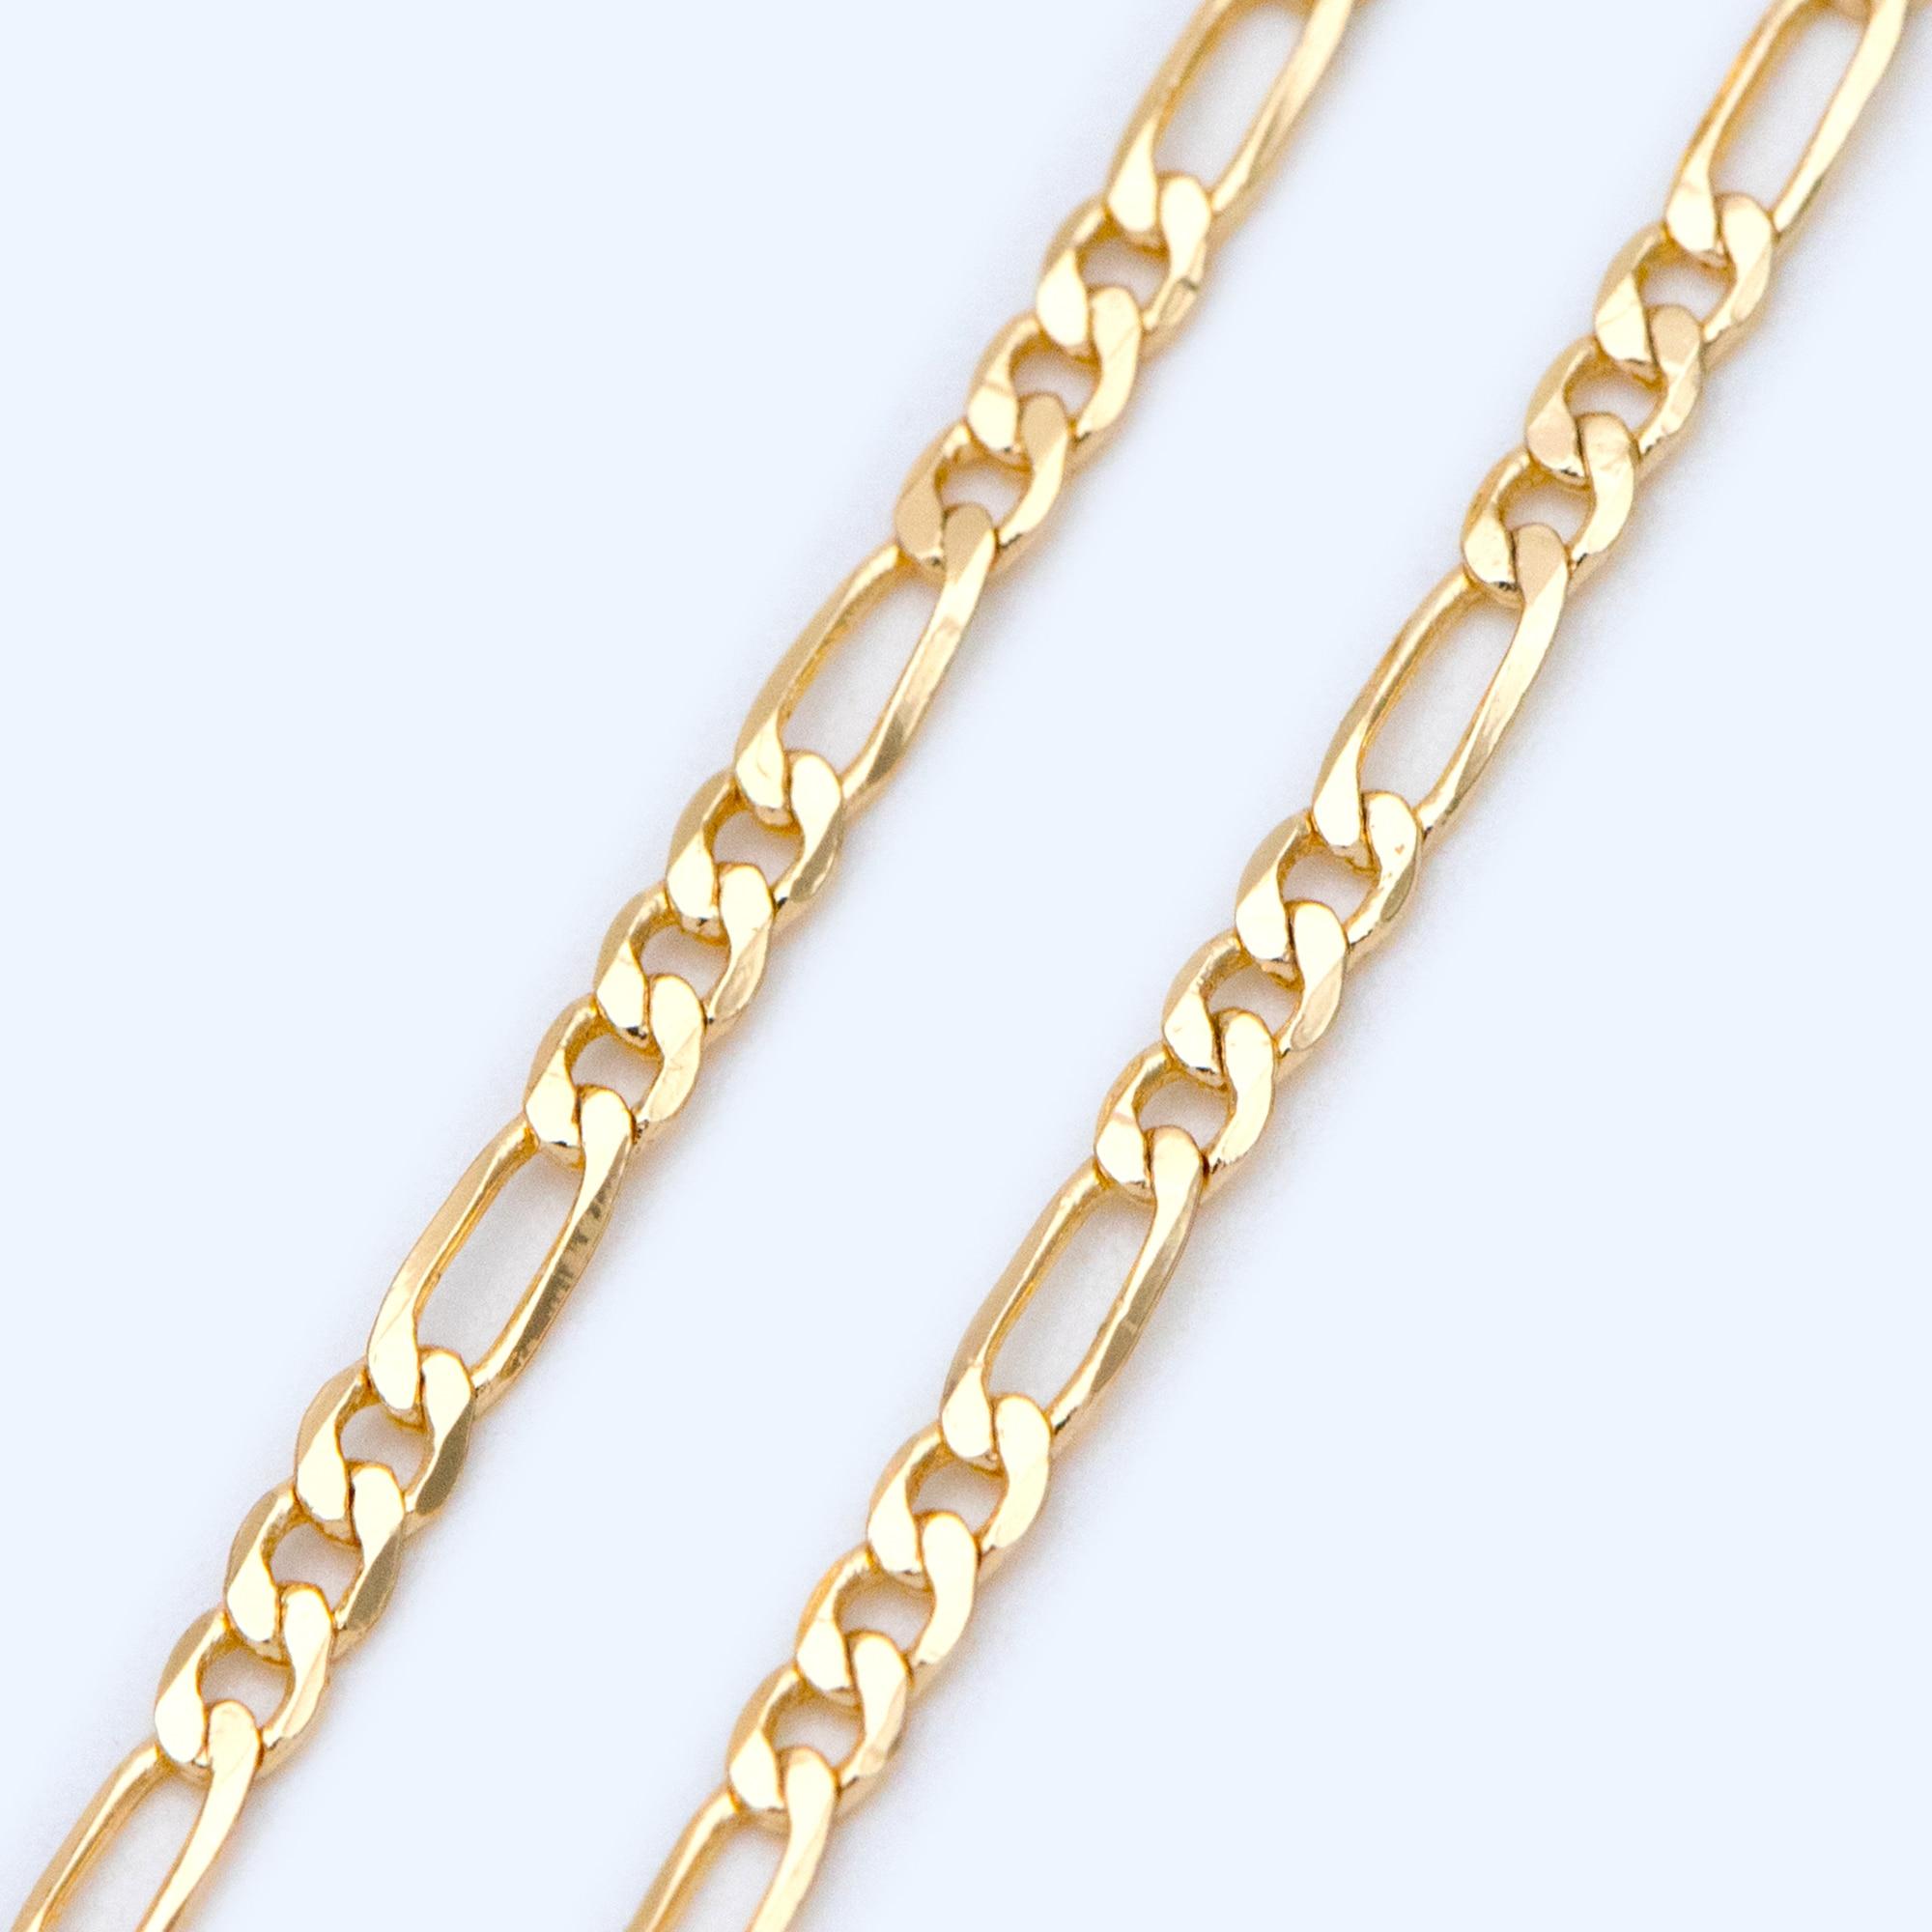 Sample Lot 3 feet Antique Brass Figaro Chain of Antique Bronze SOLDERED Chain Sturdy figaro chain 2x4.5mm Necklace Bracelet Wholesale bulk